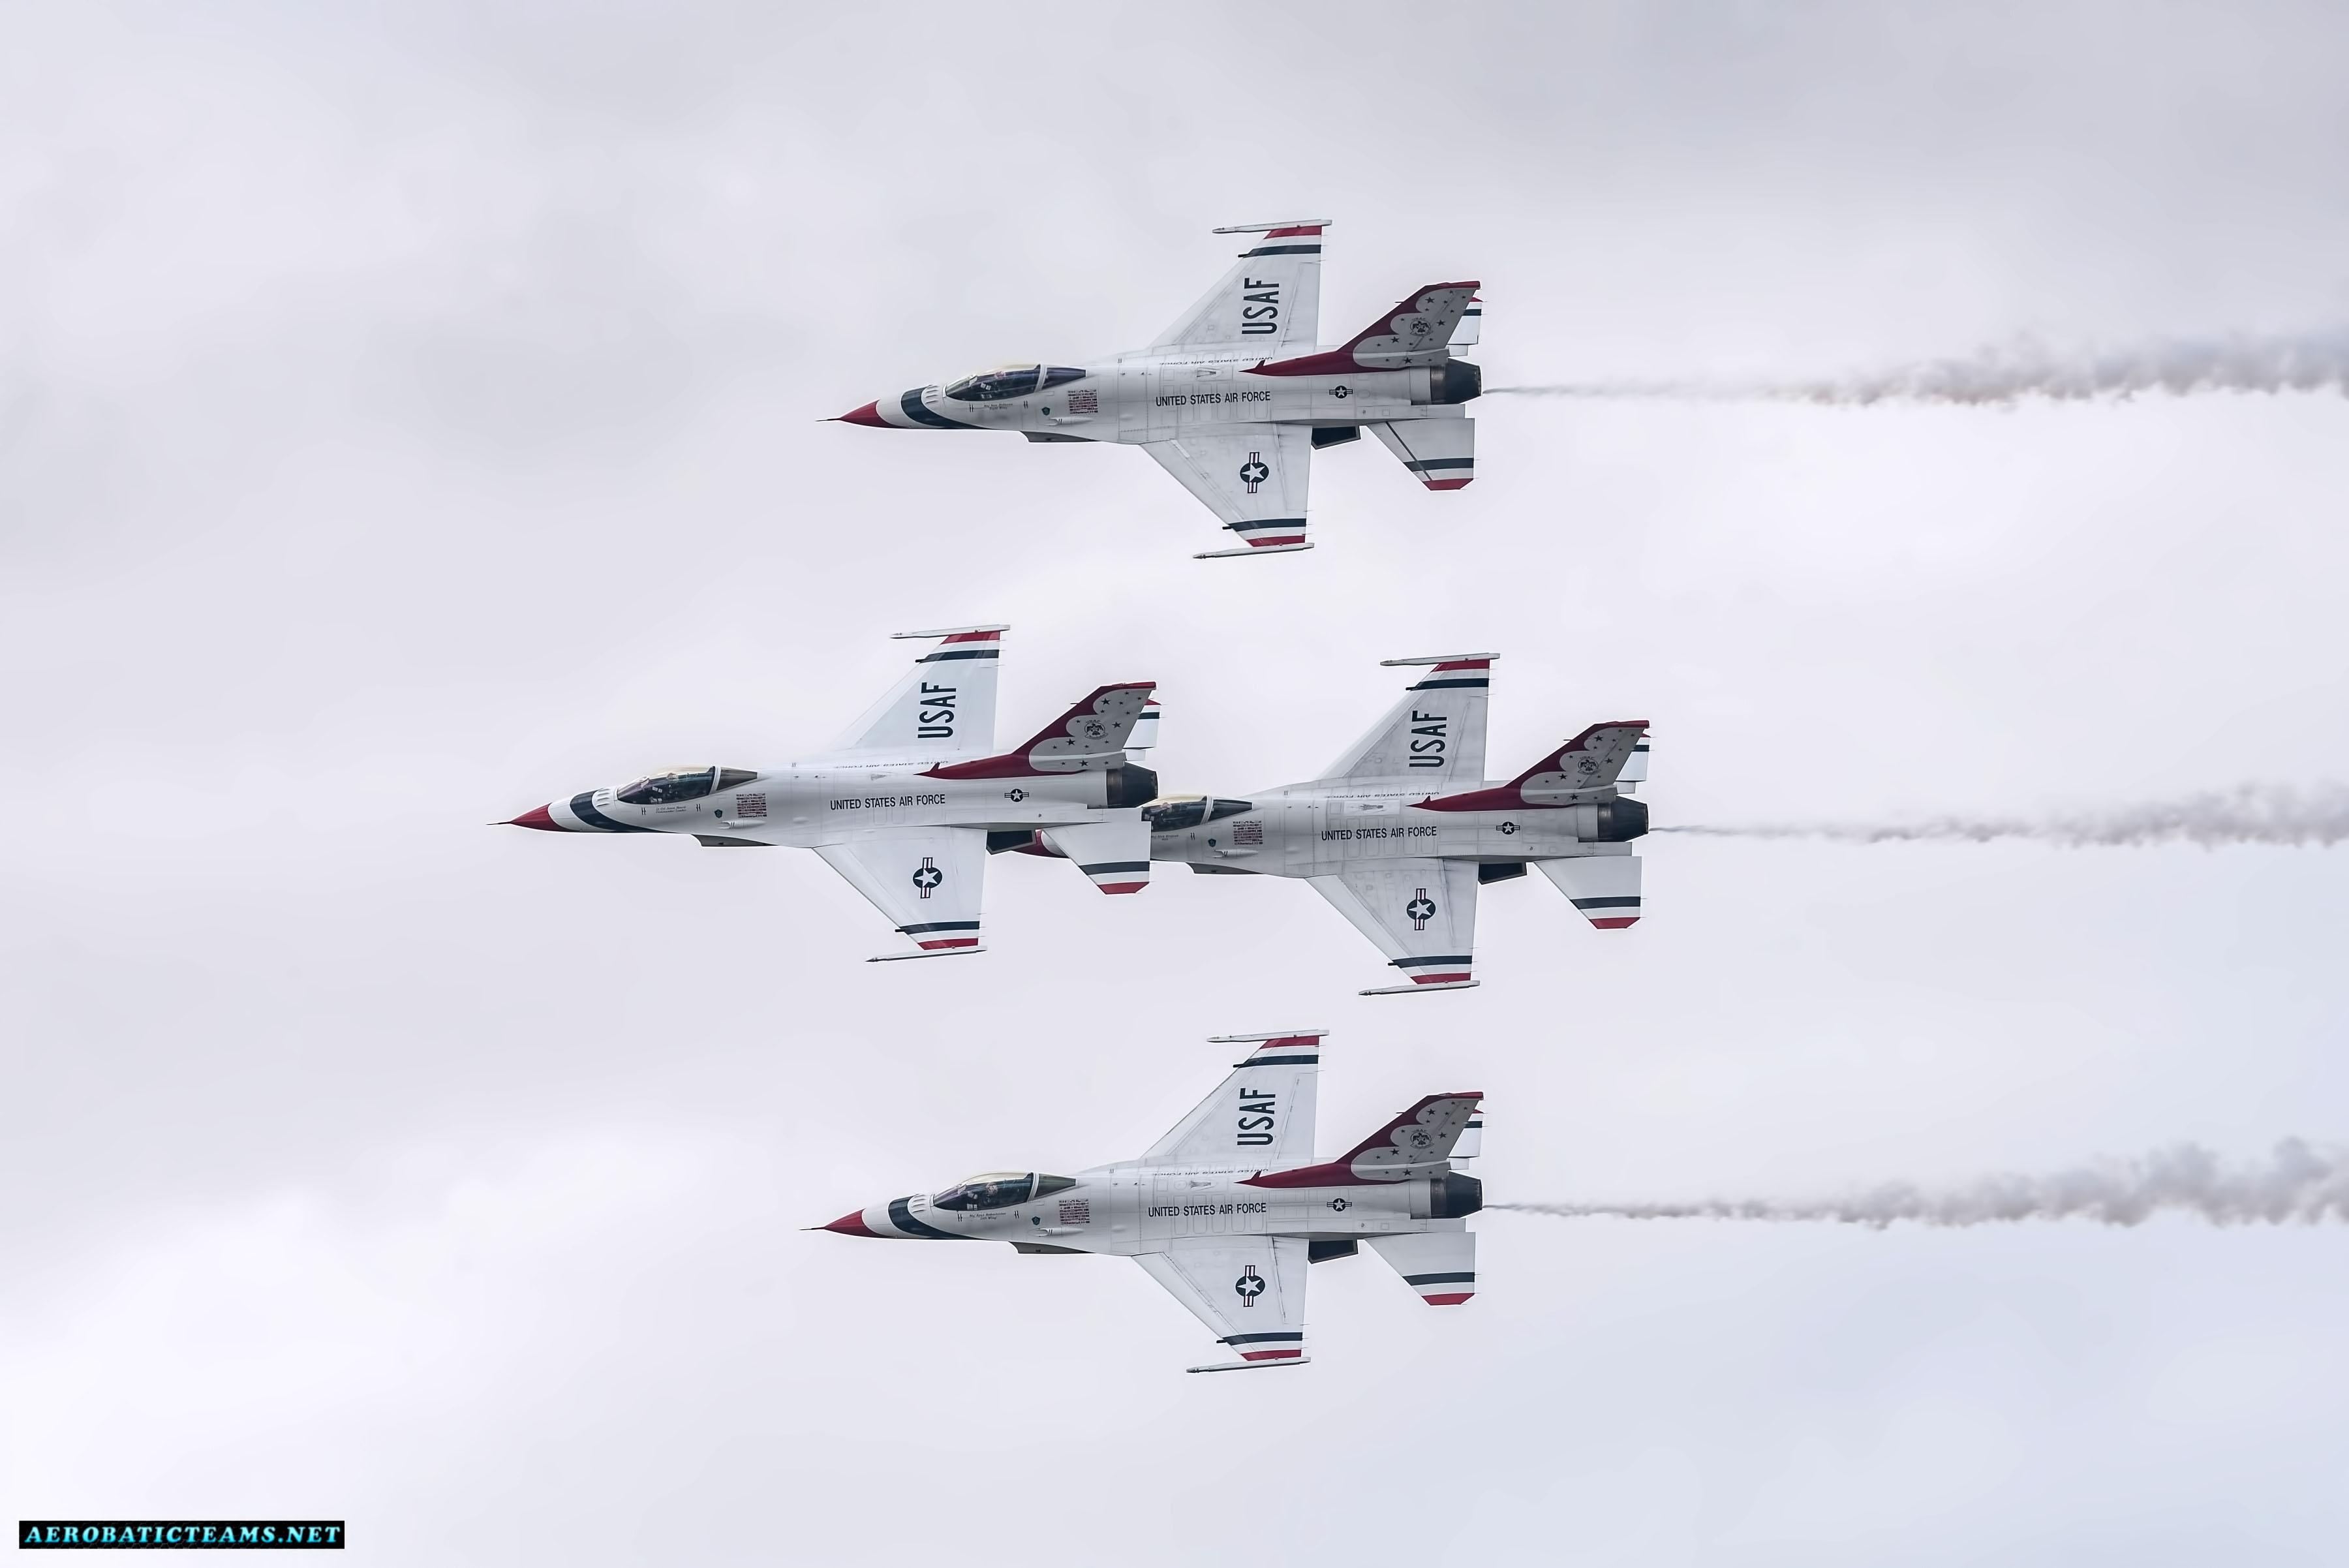 USAF Thunderbirds resume airshow displays after the crash